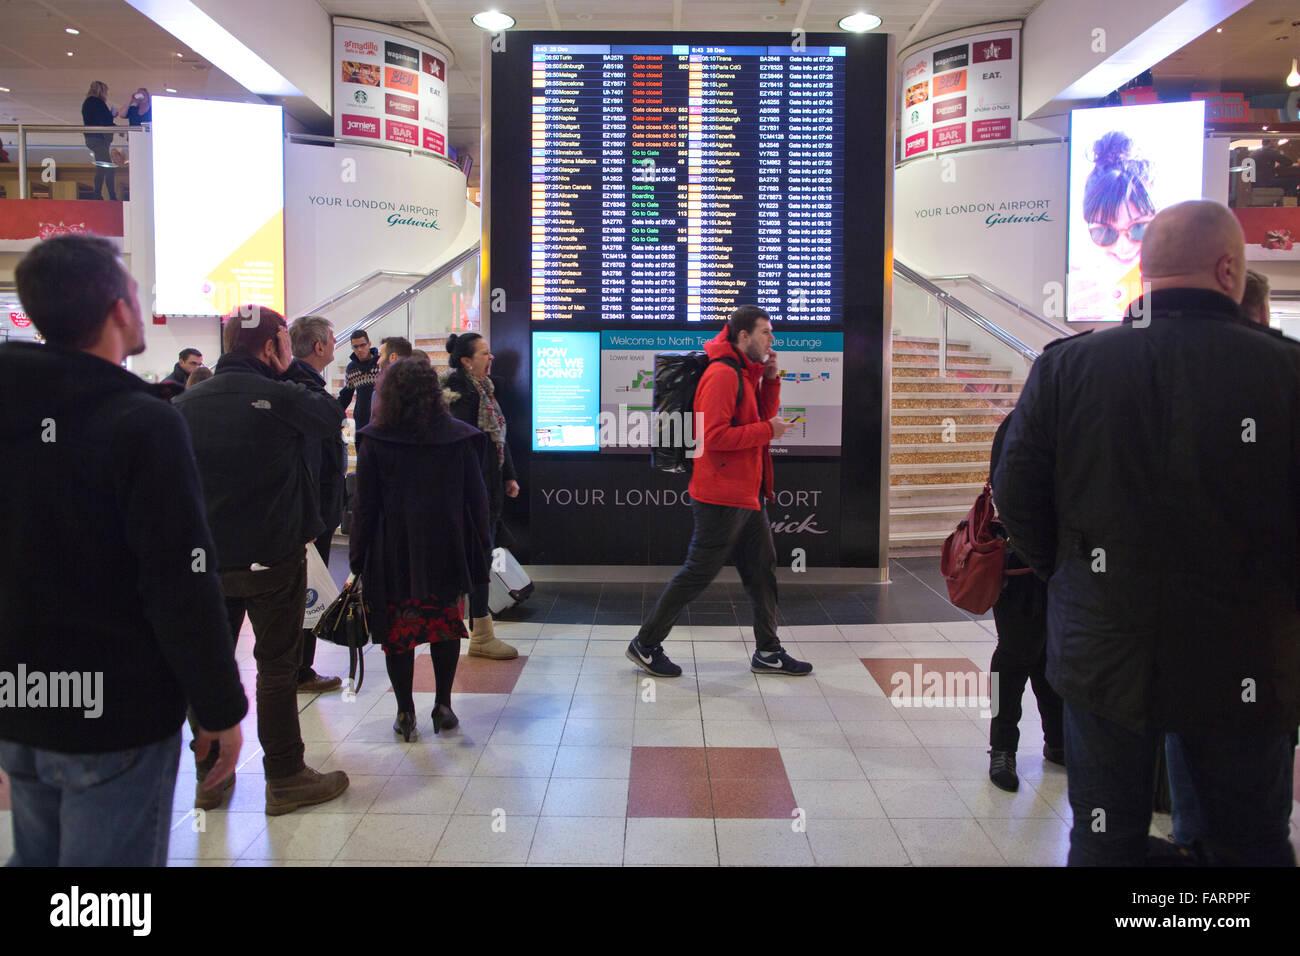 Departures flight information screen, Gatwick North terminal, England, United Kingdom - Stock Image